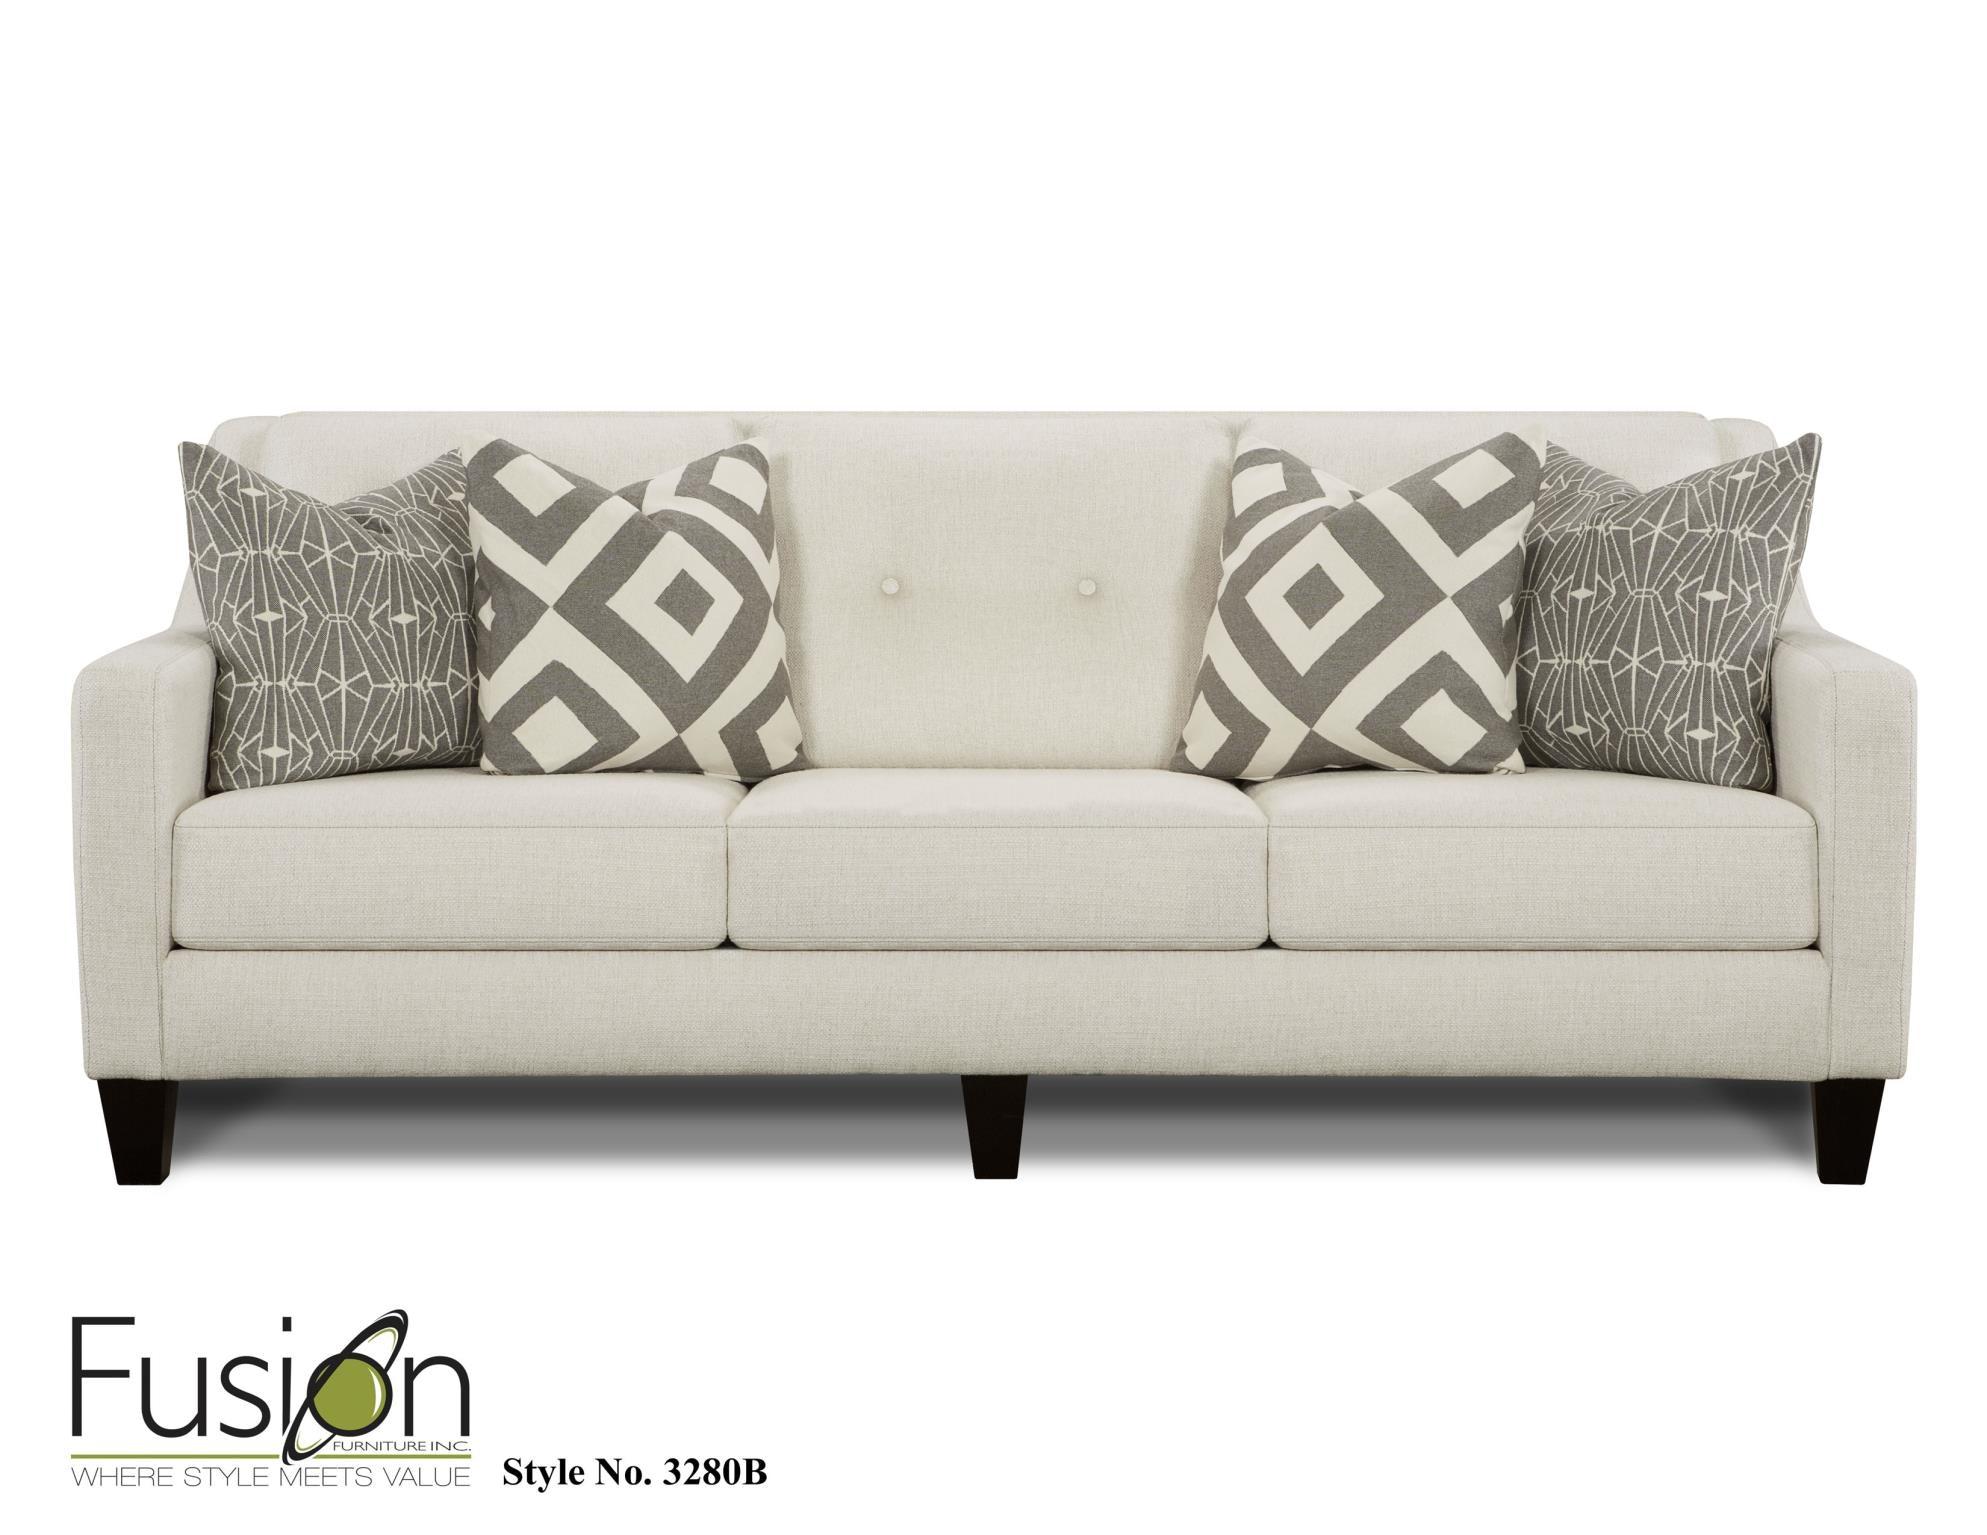 Fusion Sofa 3280BSugarshack Glacier